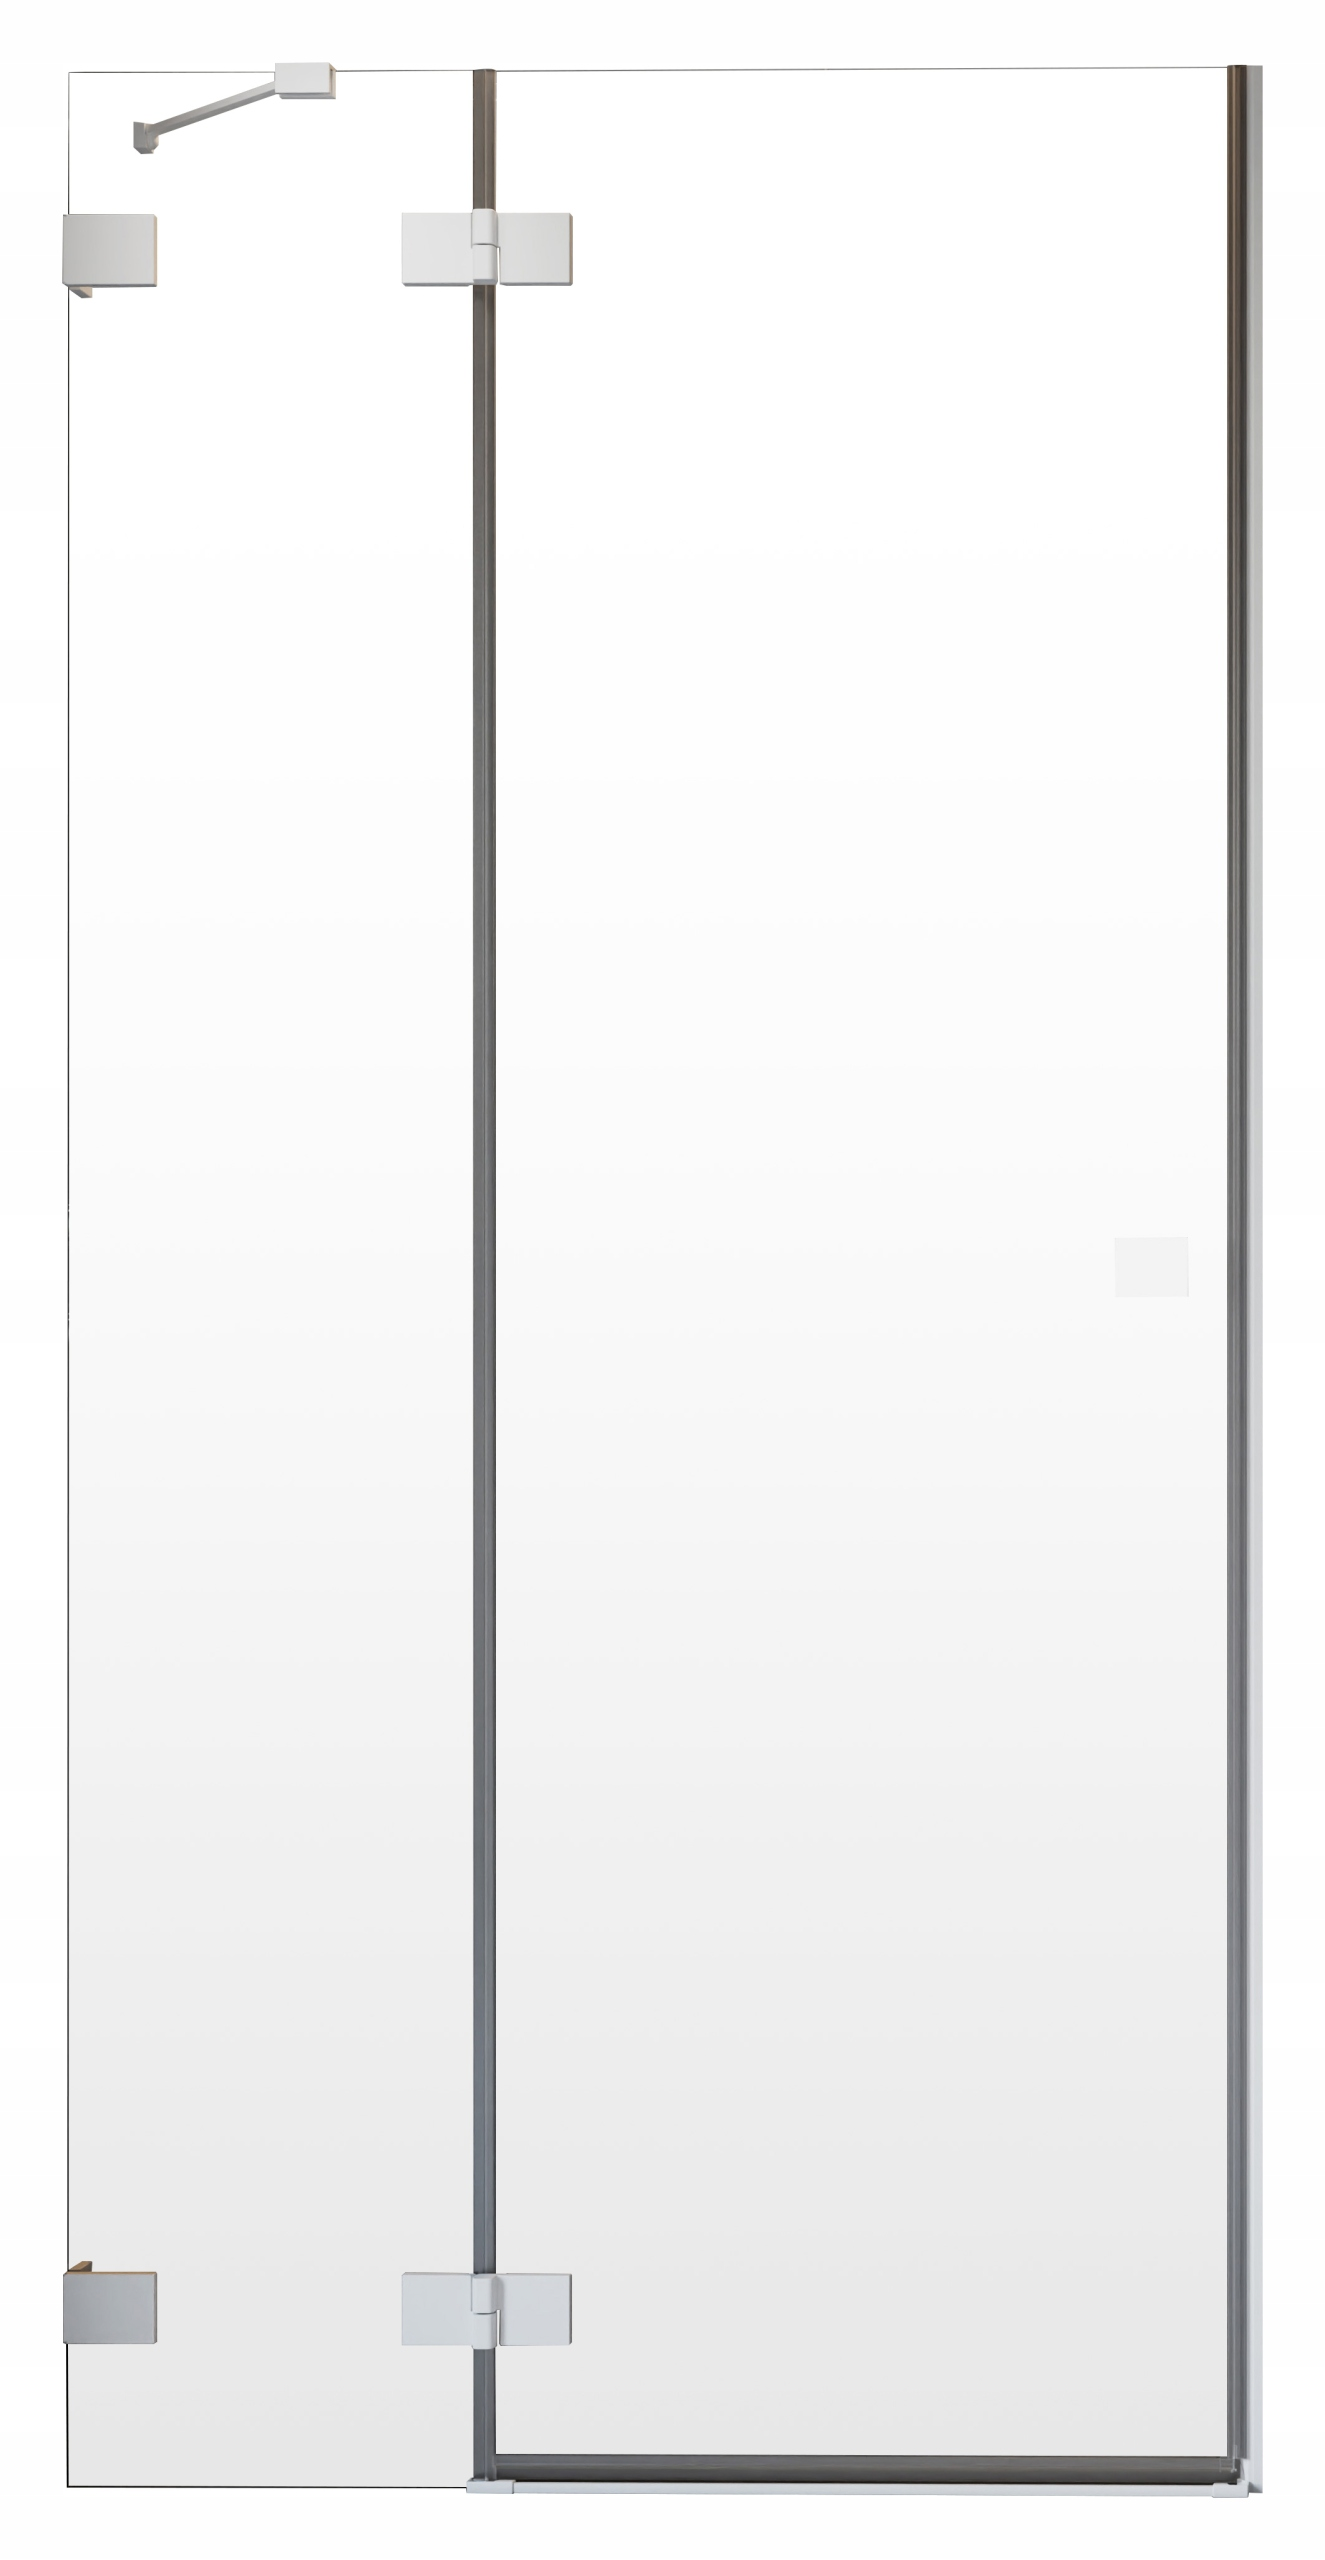 Sprchové dvere Essenza Pro White DWJ 130 Radaway